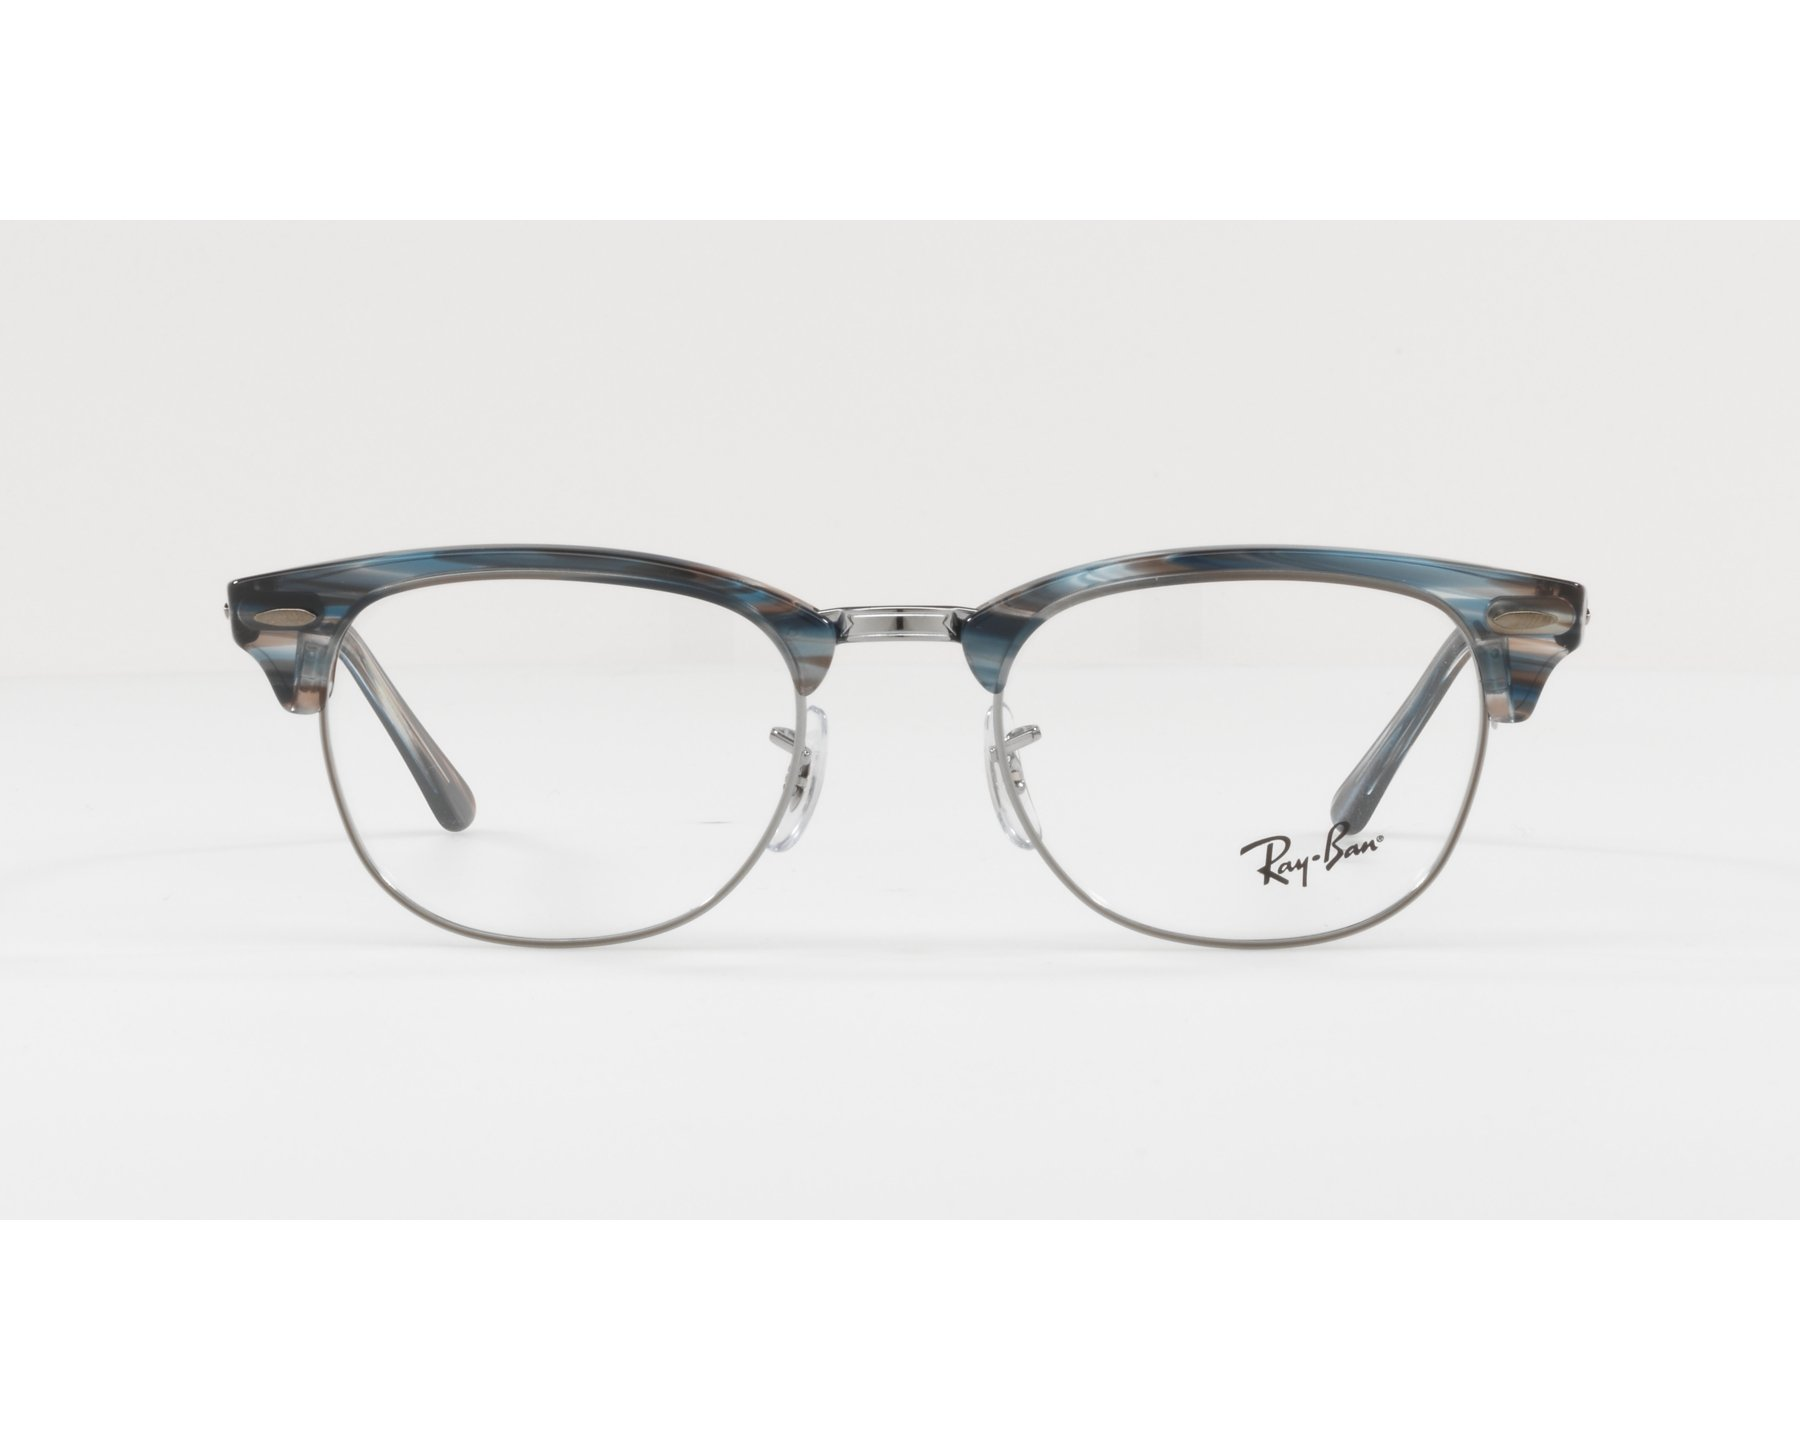 f04c322dadc34 Eyeglasses Ray-Ban Clubmaster RX-5154 - 5750